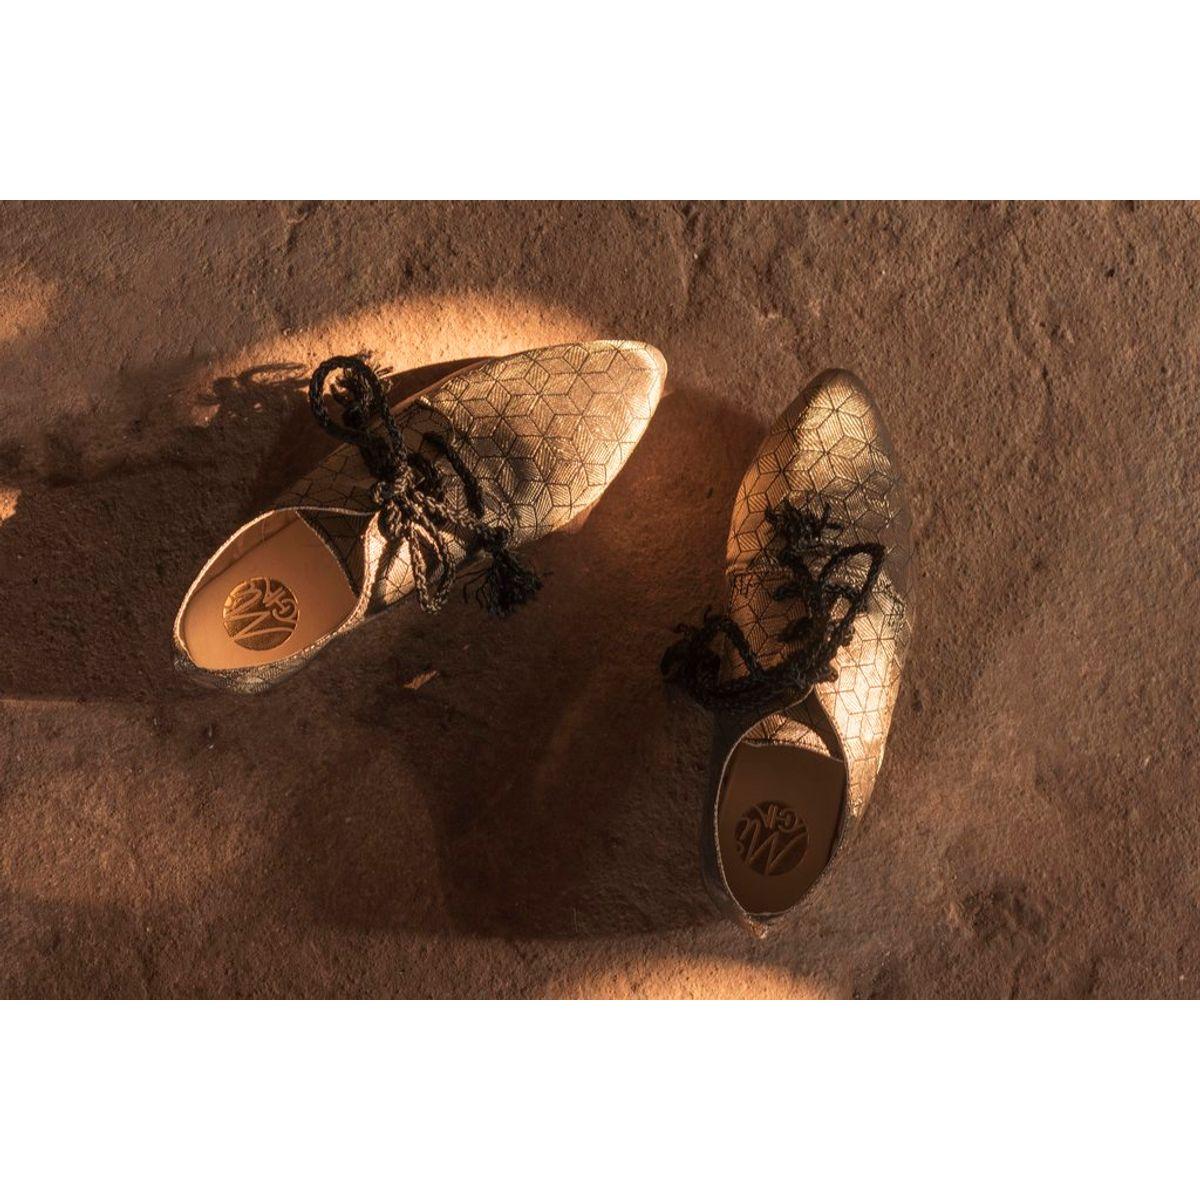 MiCHA golden black designer shoe